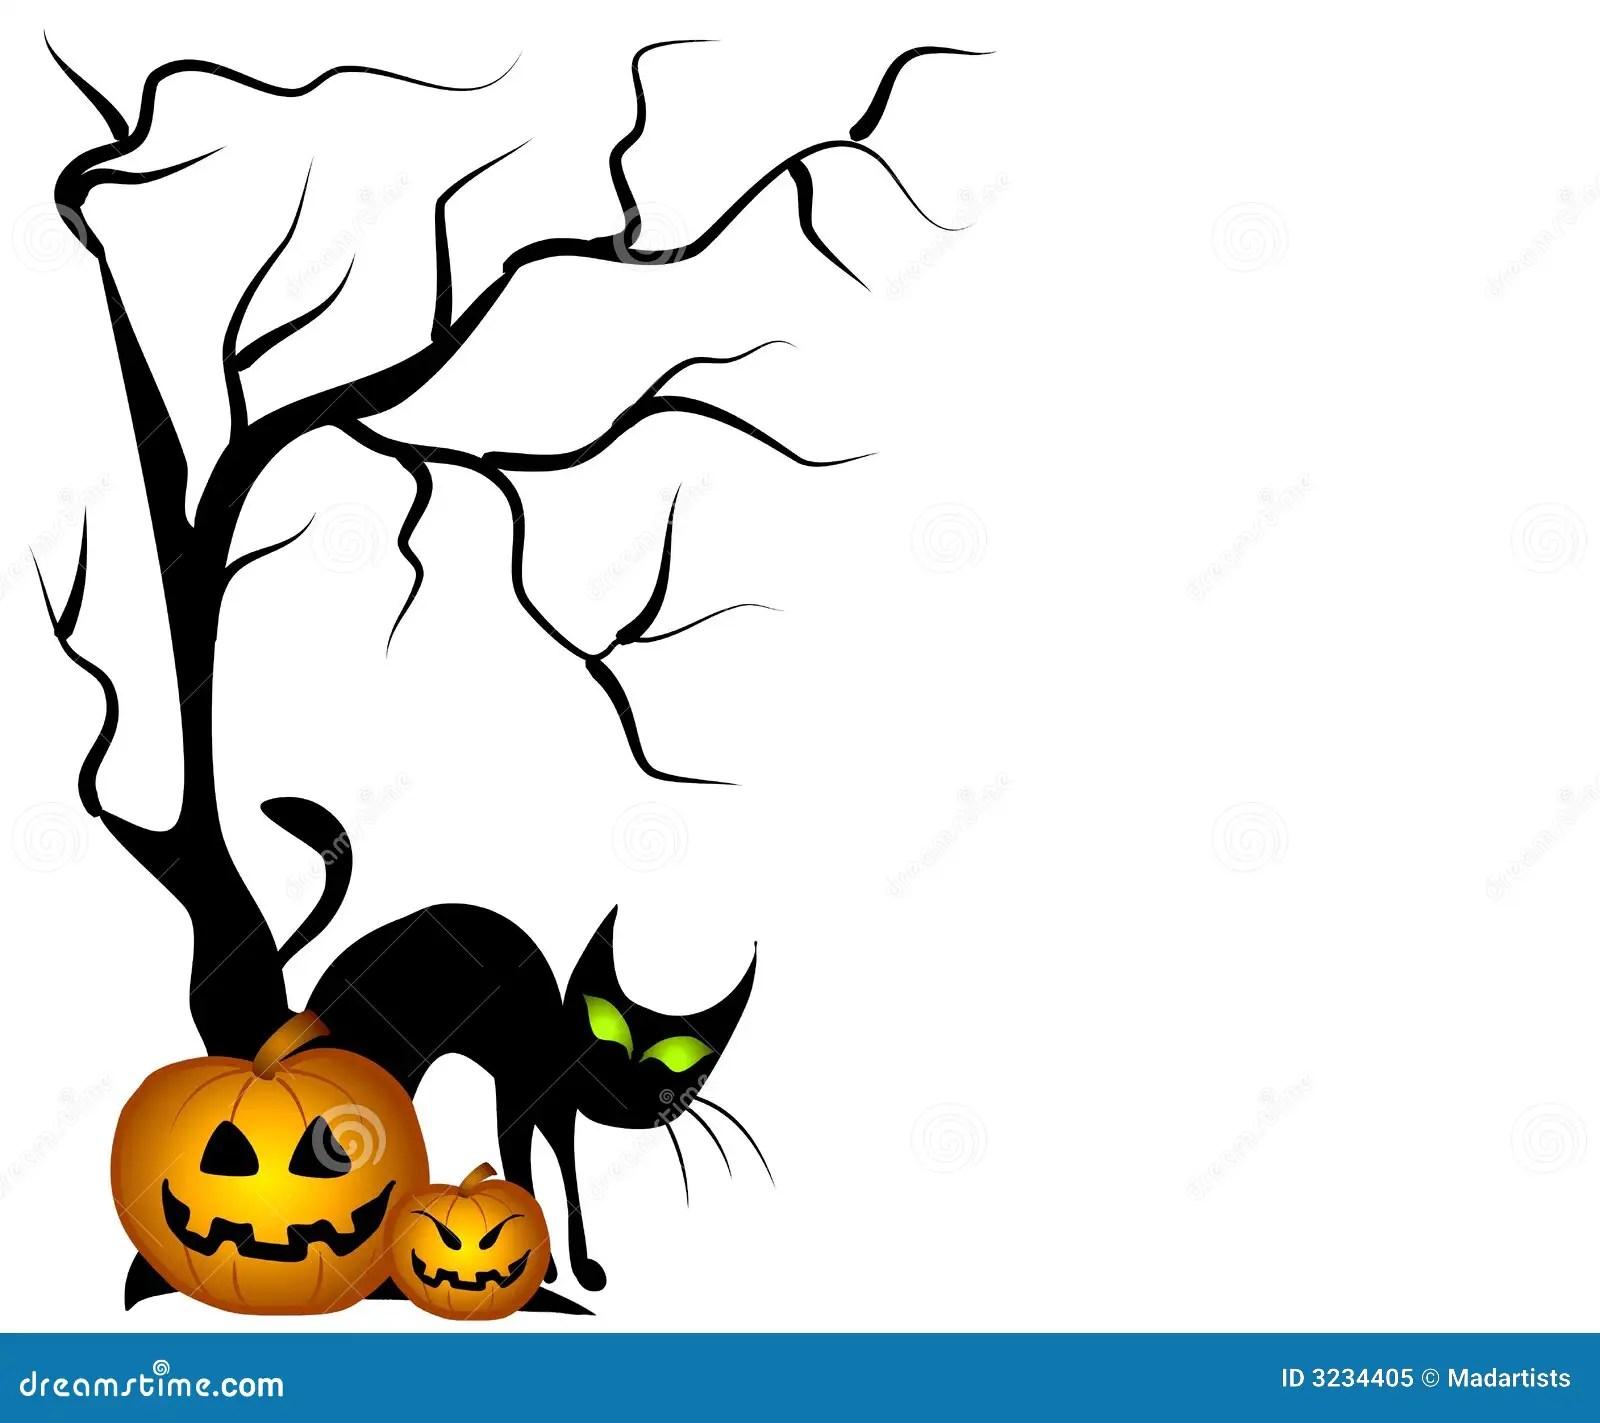 Find the perfect black cat halloween black & white image. Black Cat Halloween Pumpkins Stock Illustration Illustration Of Lanterns Jackolantern 3234405